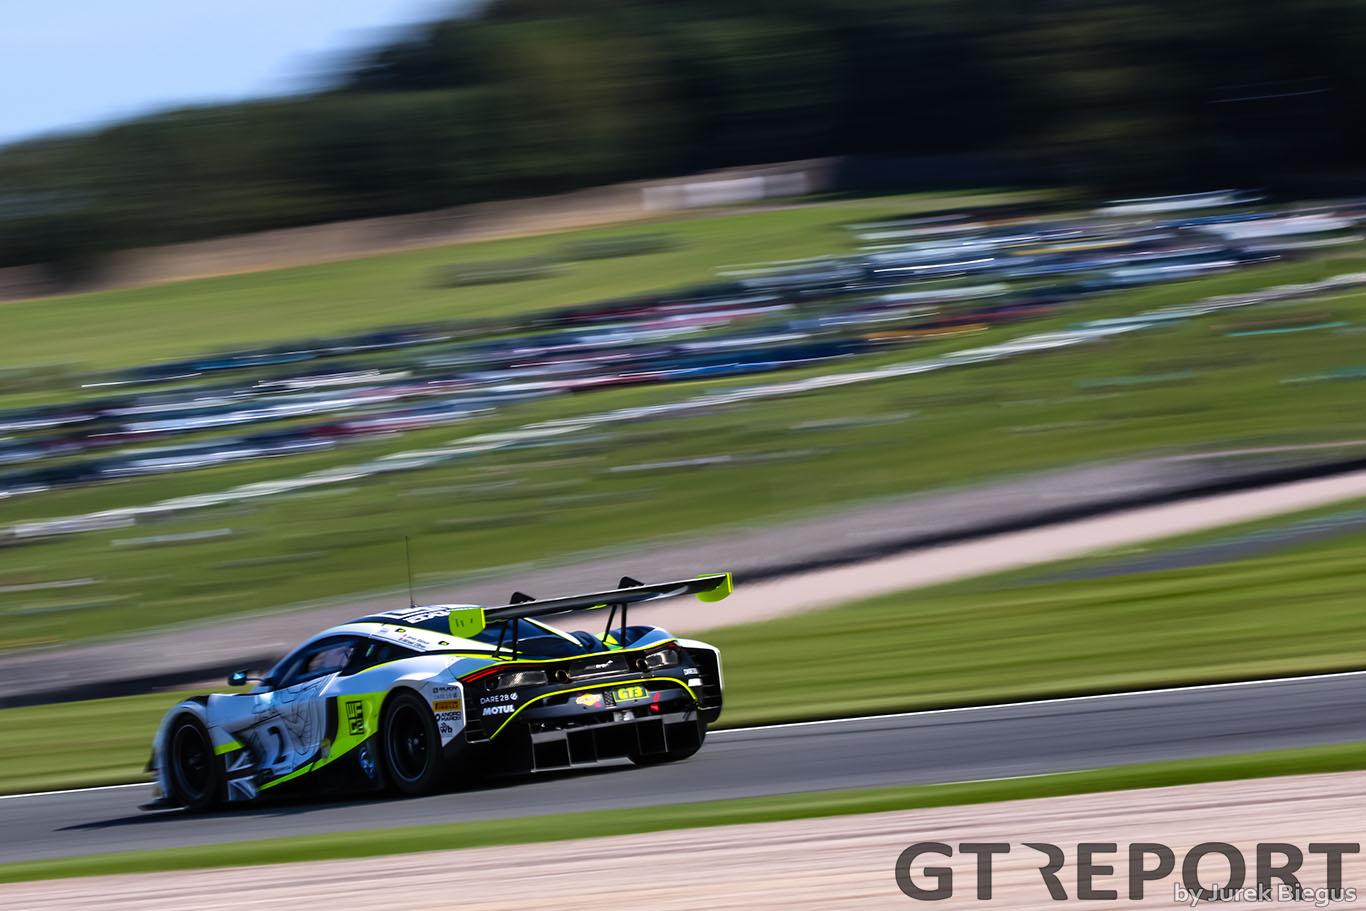 BRITISH GT DONINGTON 2020 RACE REPORT